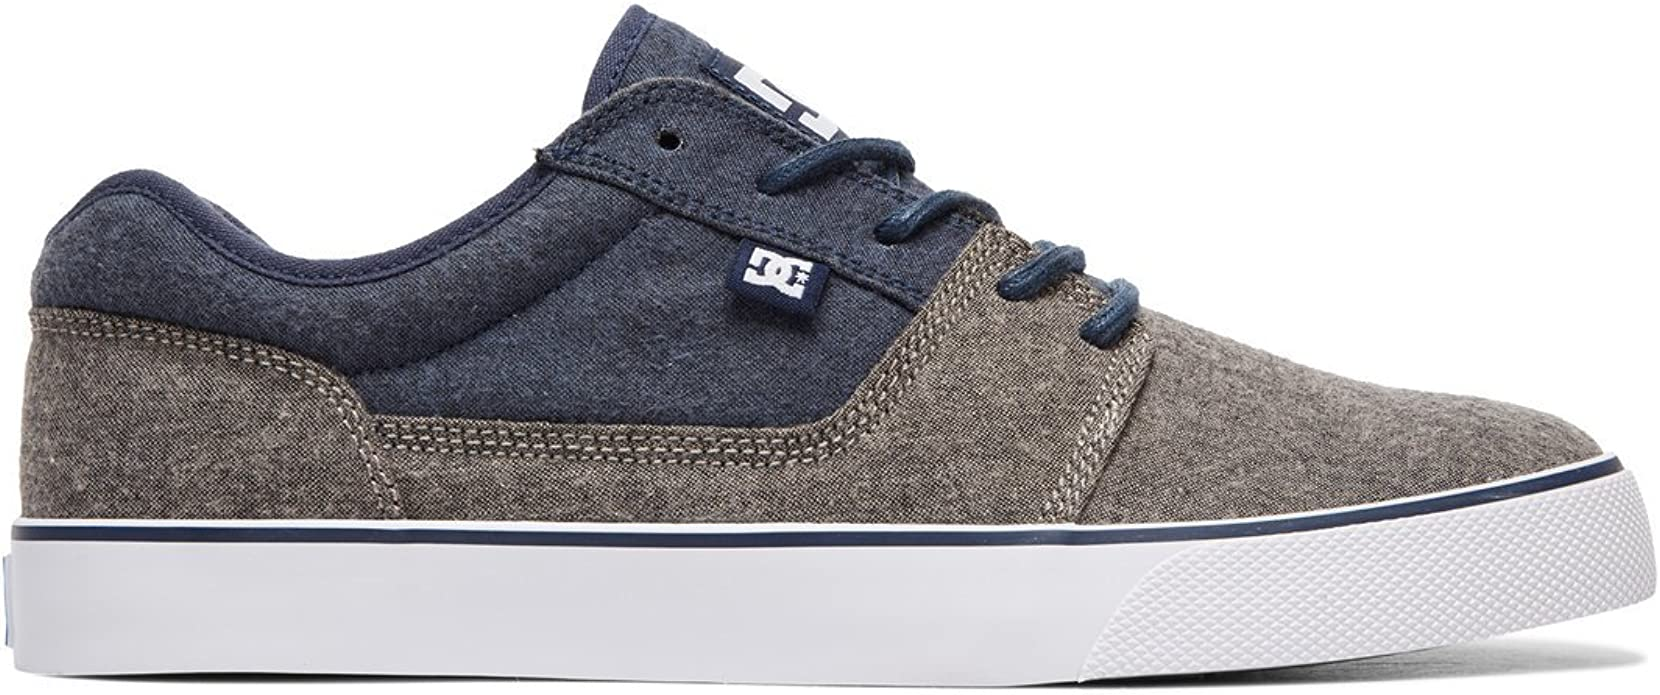 DC Shoes Tonik TX SE Sneakers Skateschuhe Herren Blau/Grau